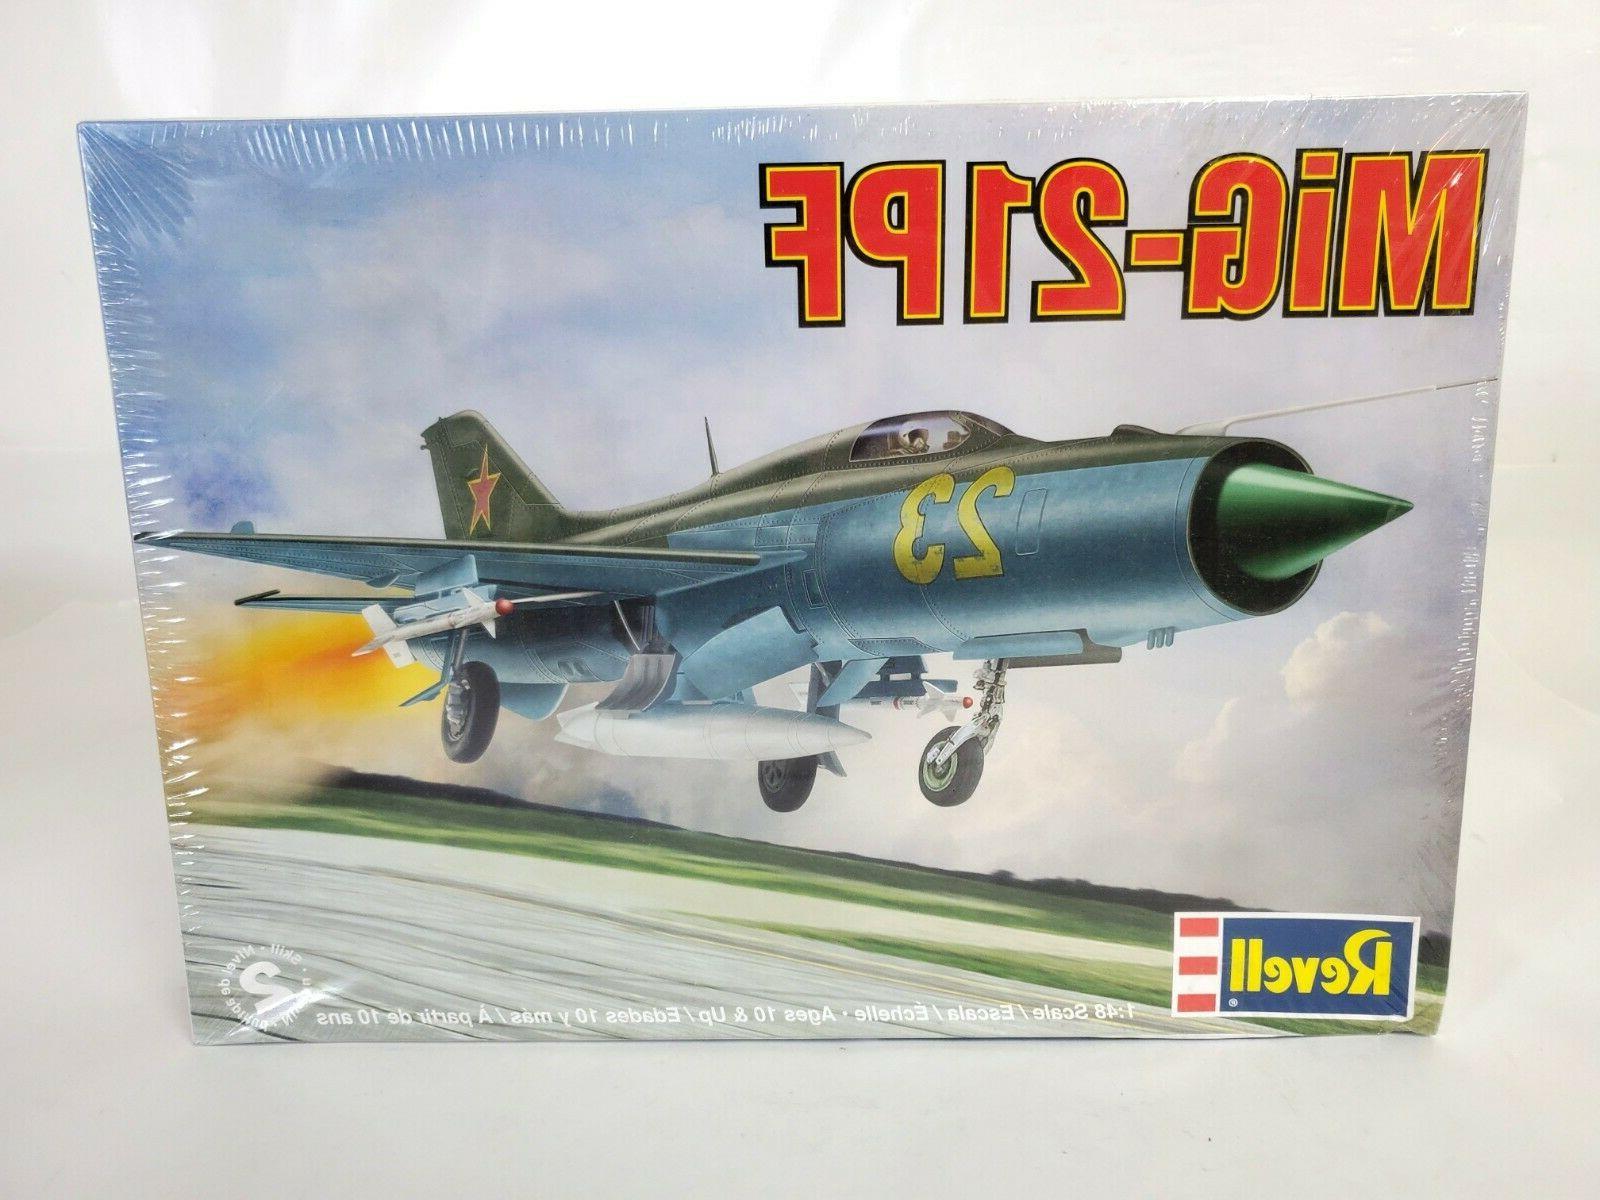 mig 21pf aircraft 1 48 scale plastic